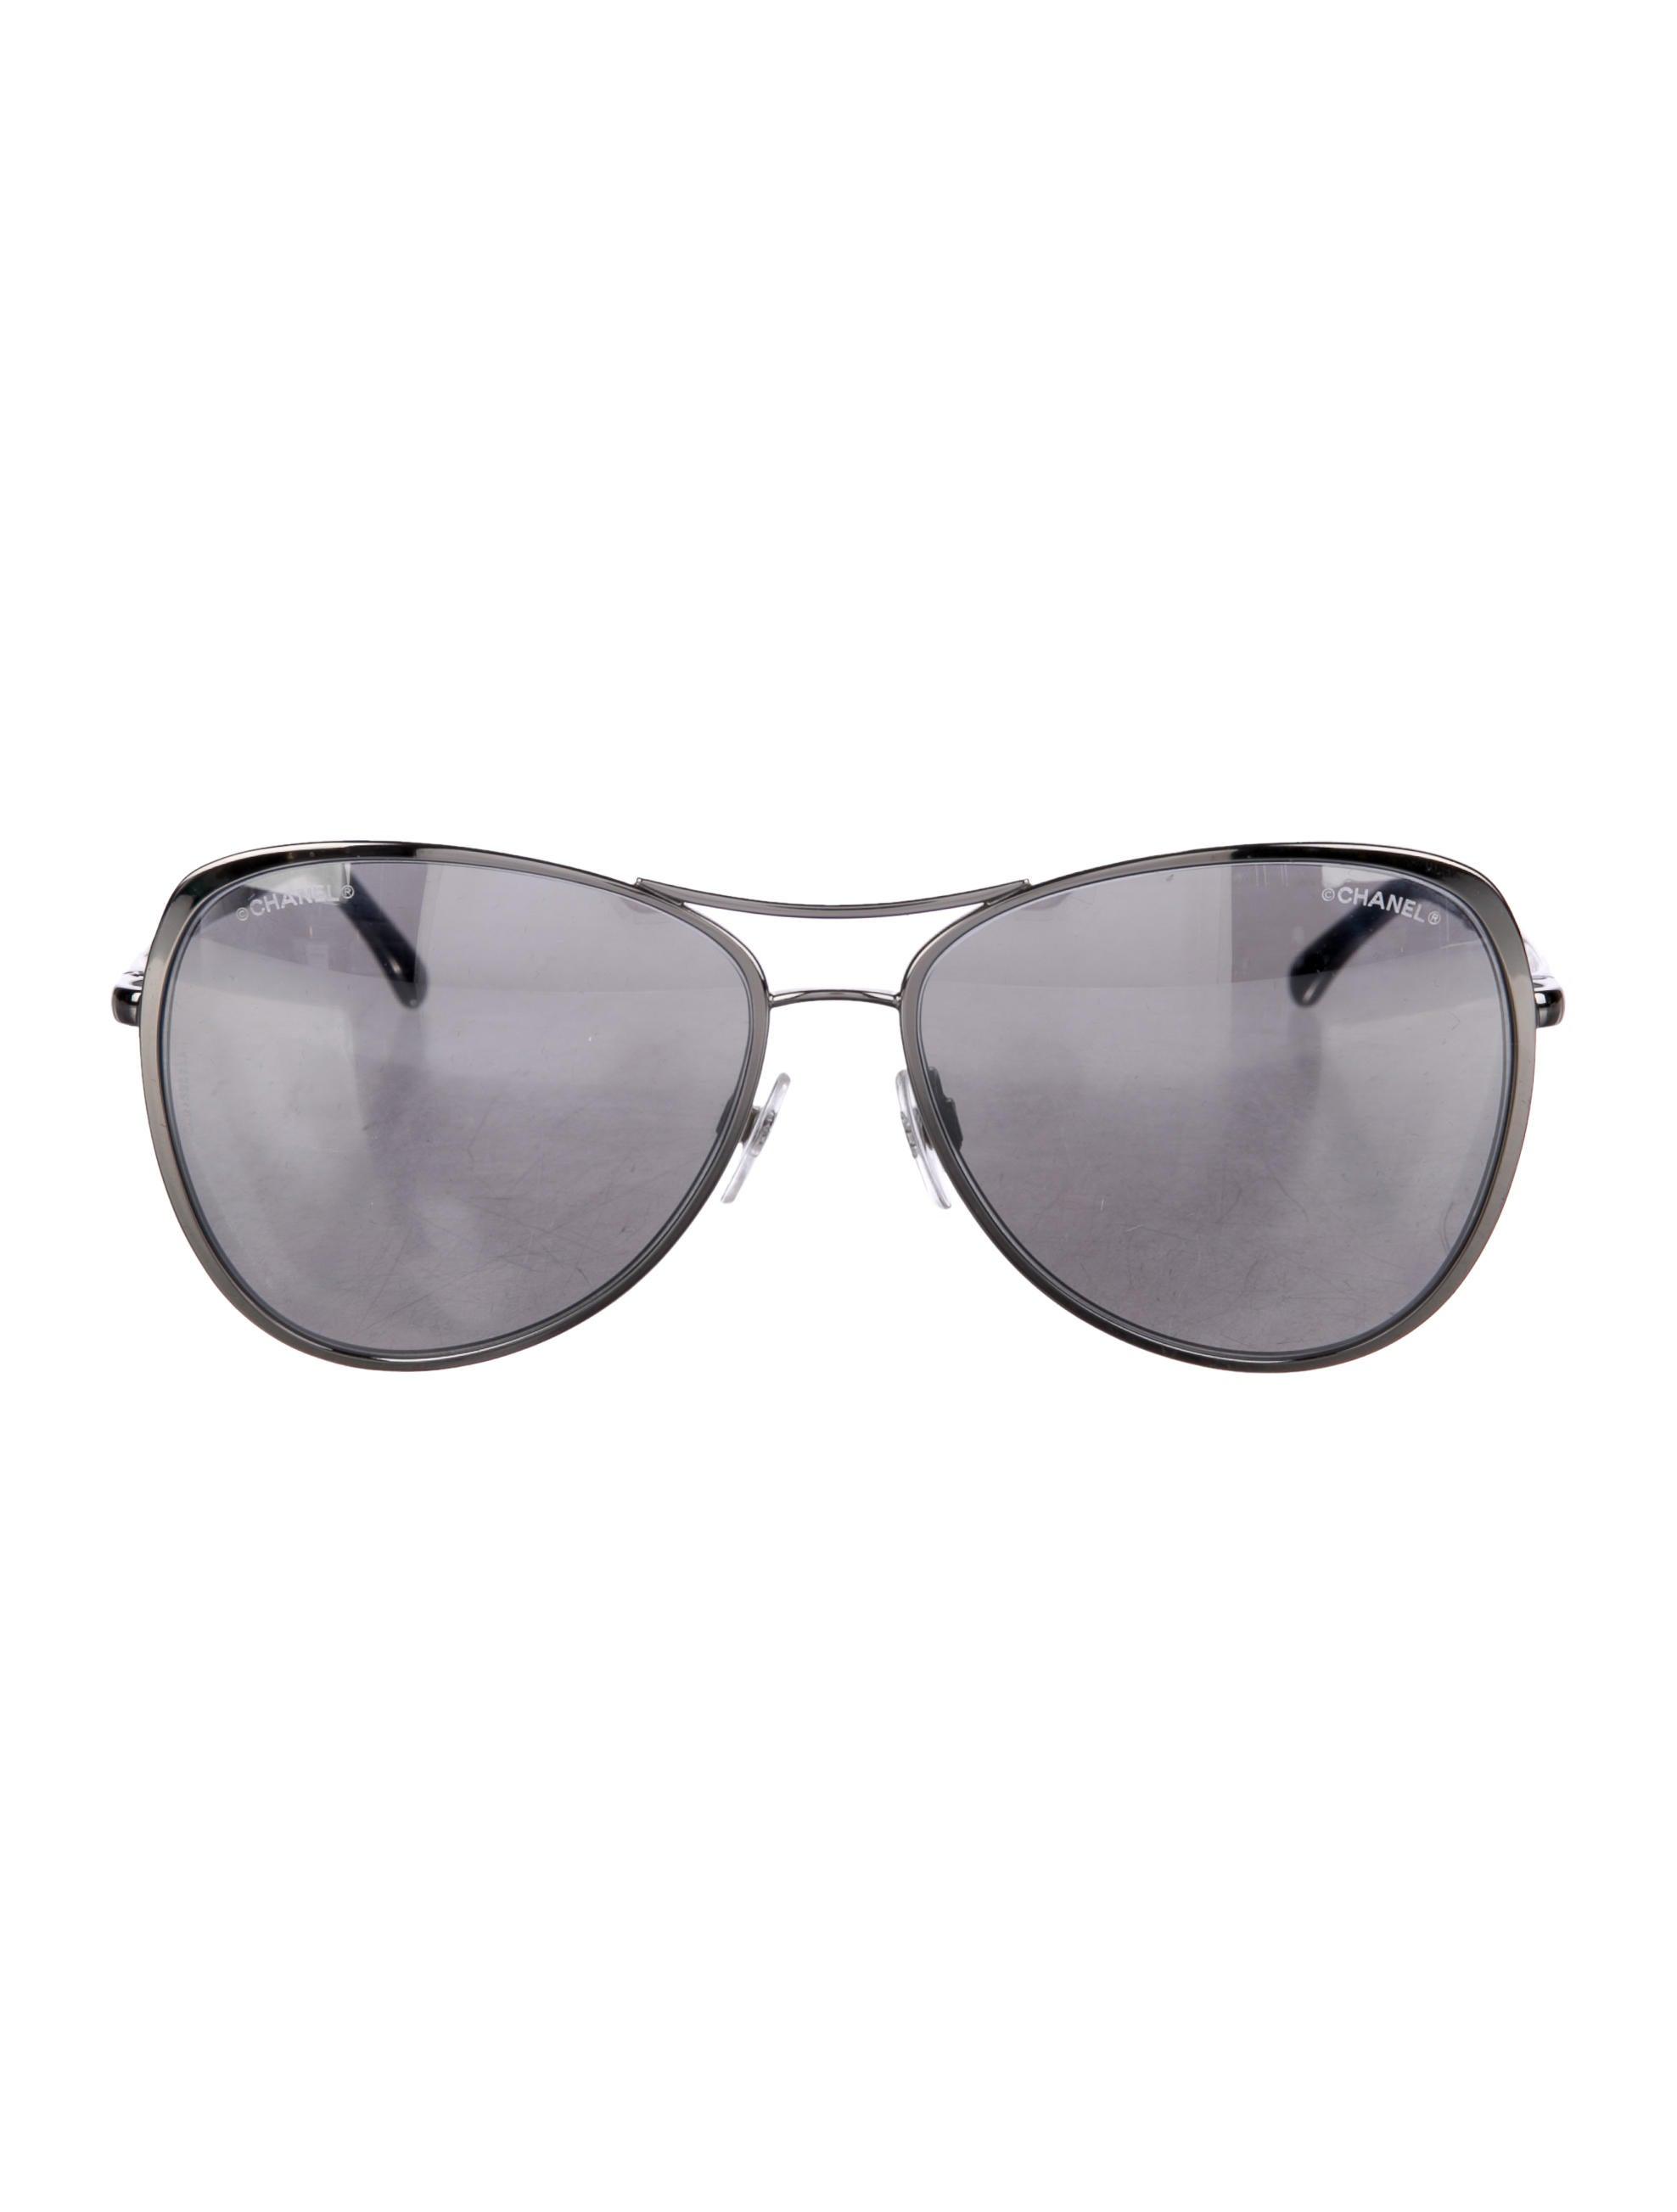 Chanel 2017 Pilot Summer Mirrored Sunglasses - Accessories ...